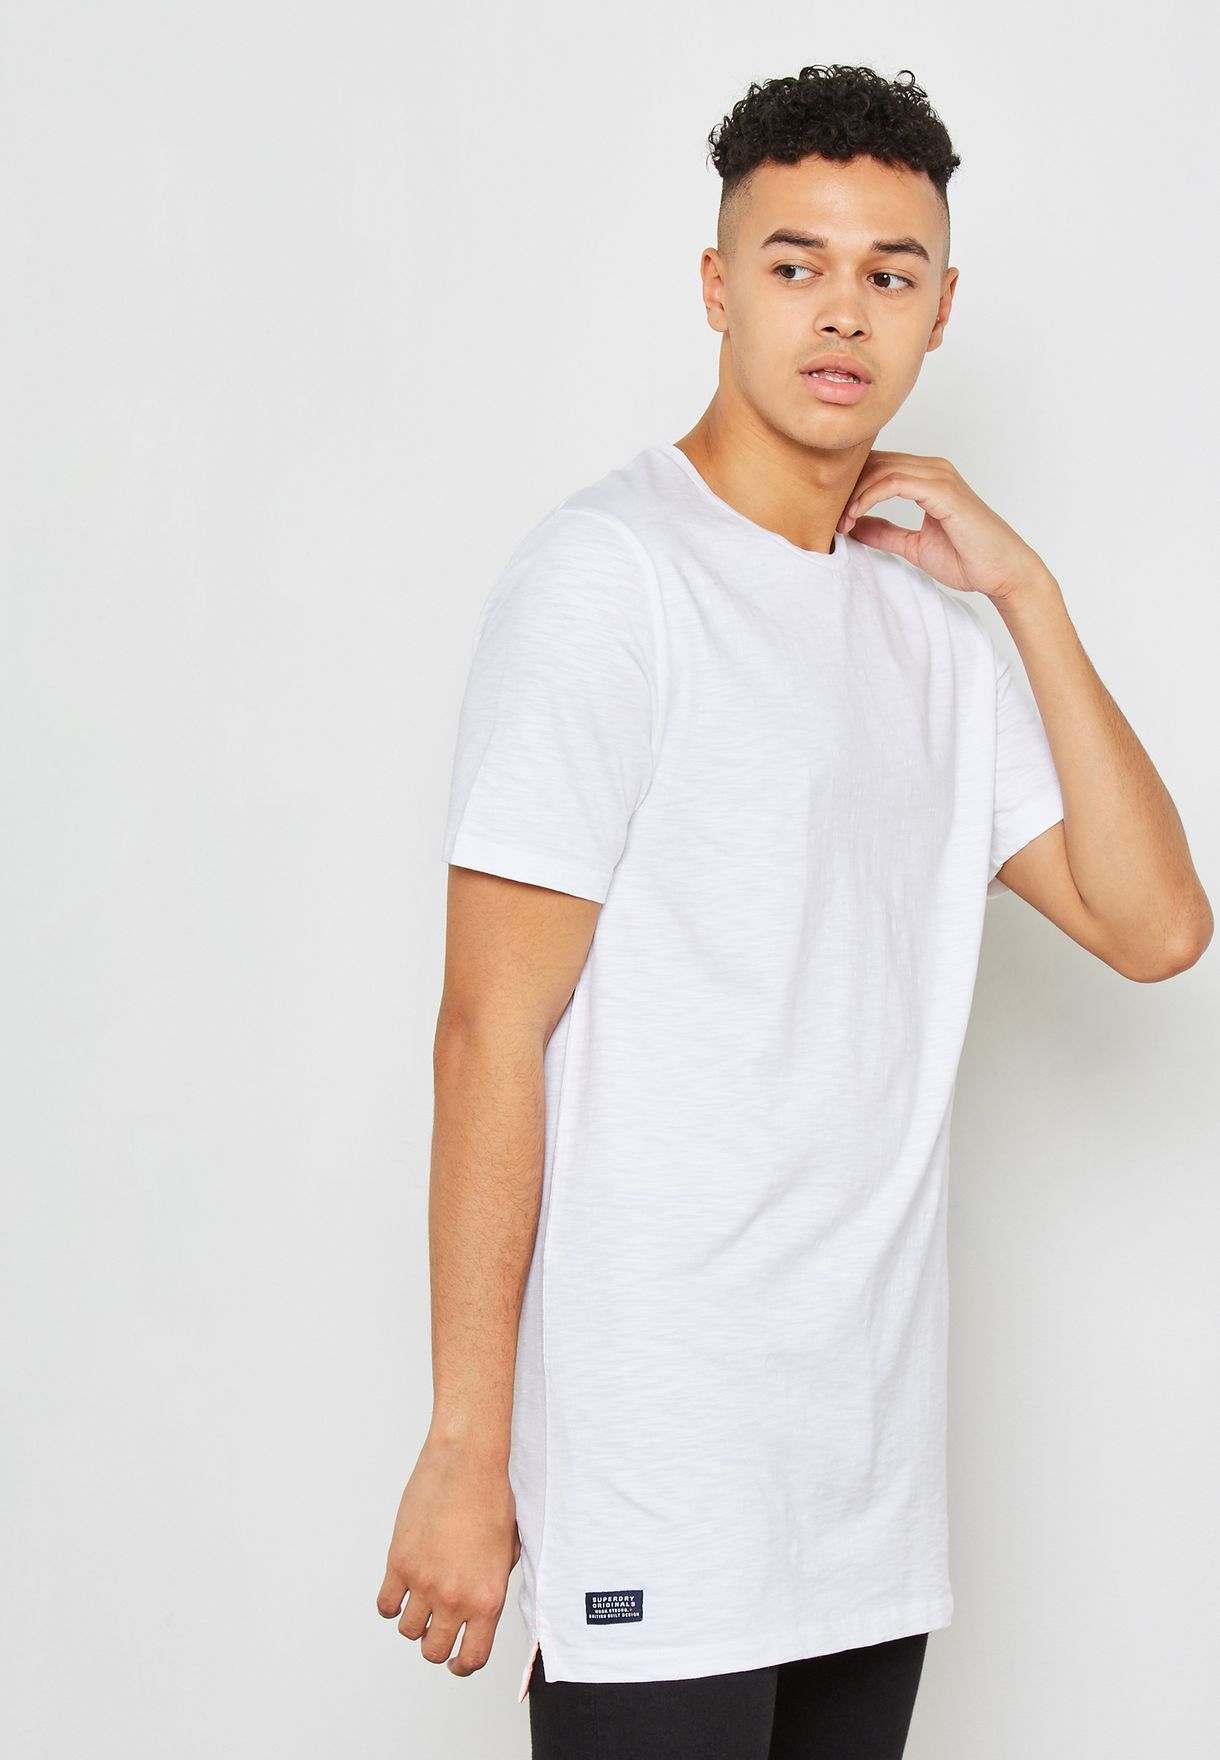 11a17de3 Shop Superdry white Dry Original Longline T-Shirt M10000MR_26C for ...